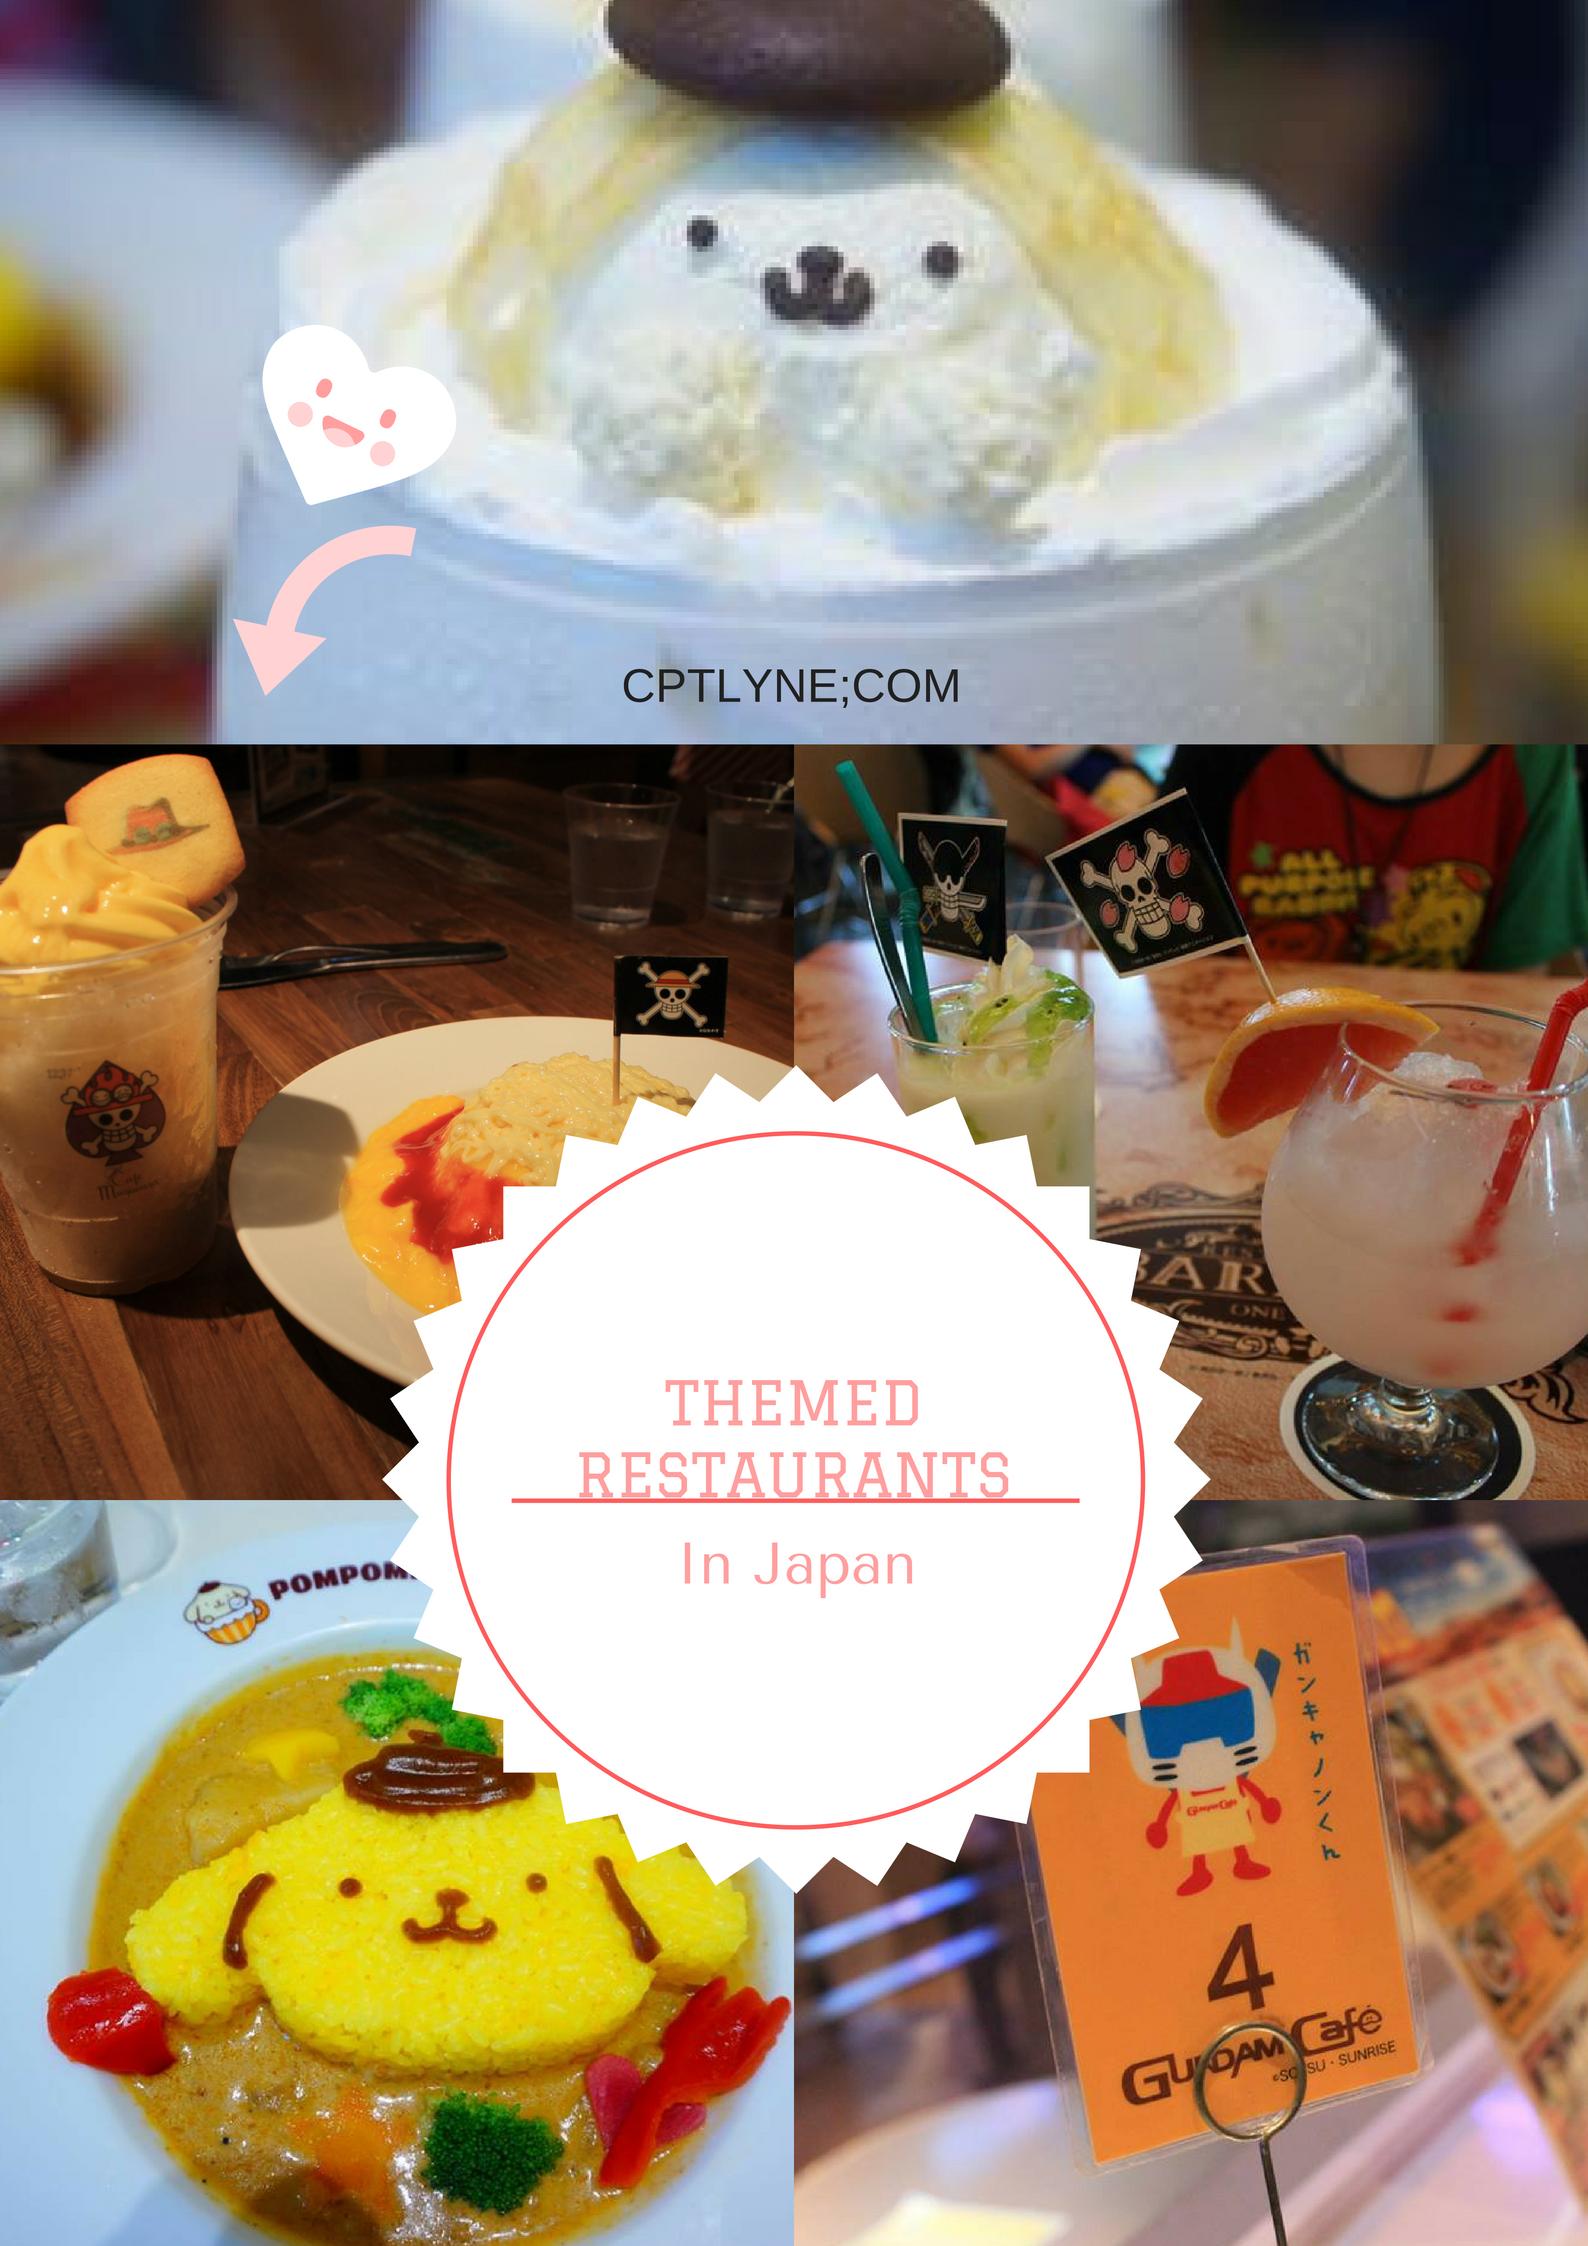 Themed restaurants in Tokyo Japan, Japan travel, Tokyo